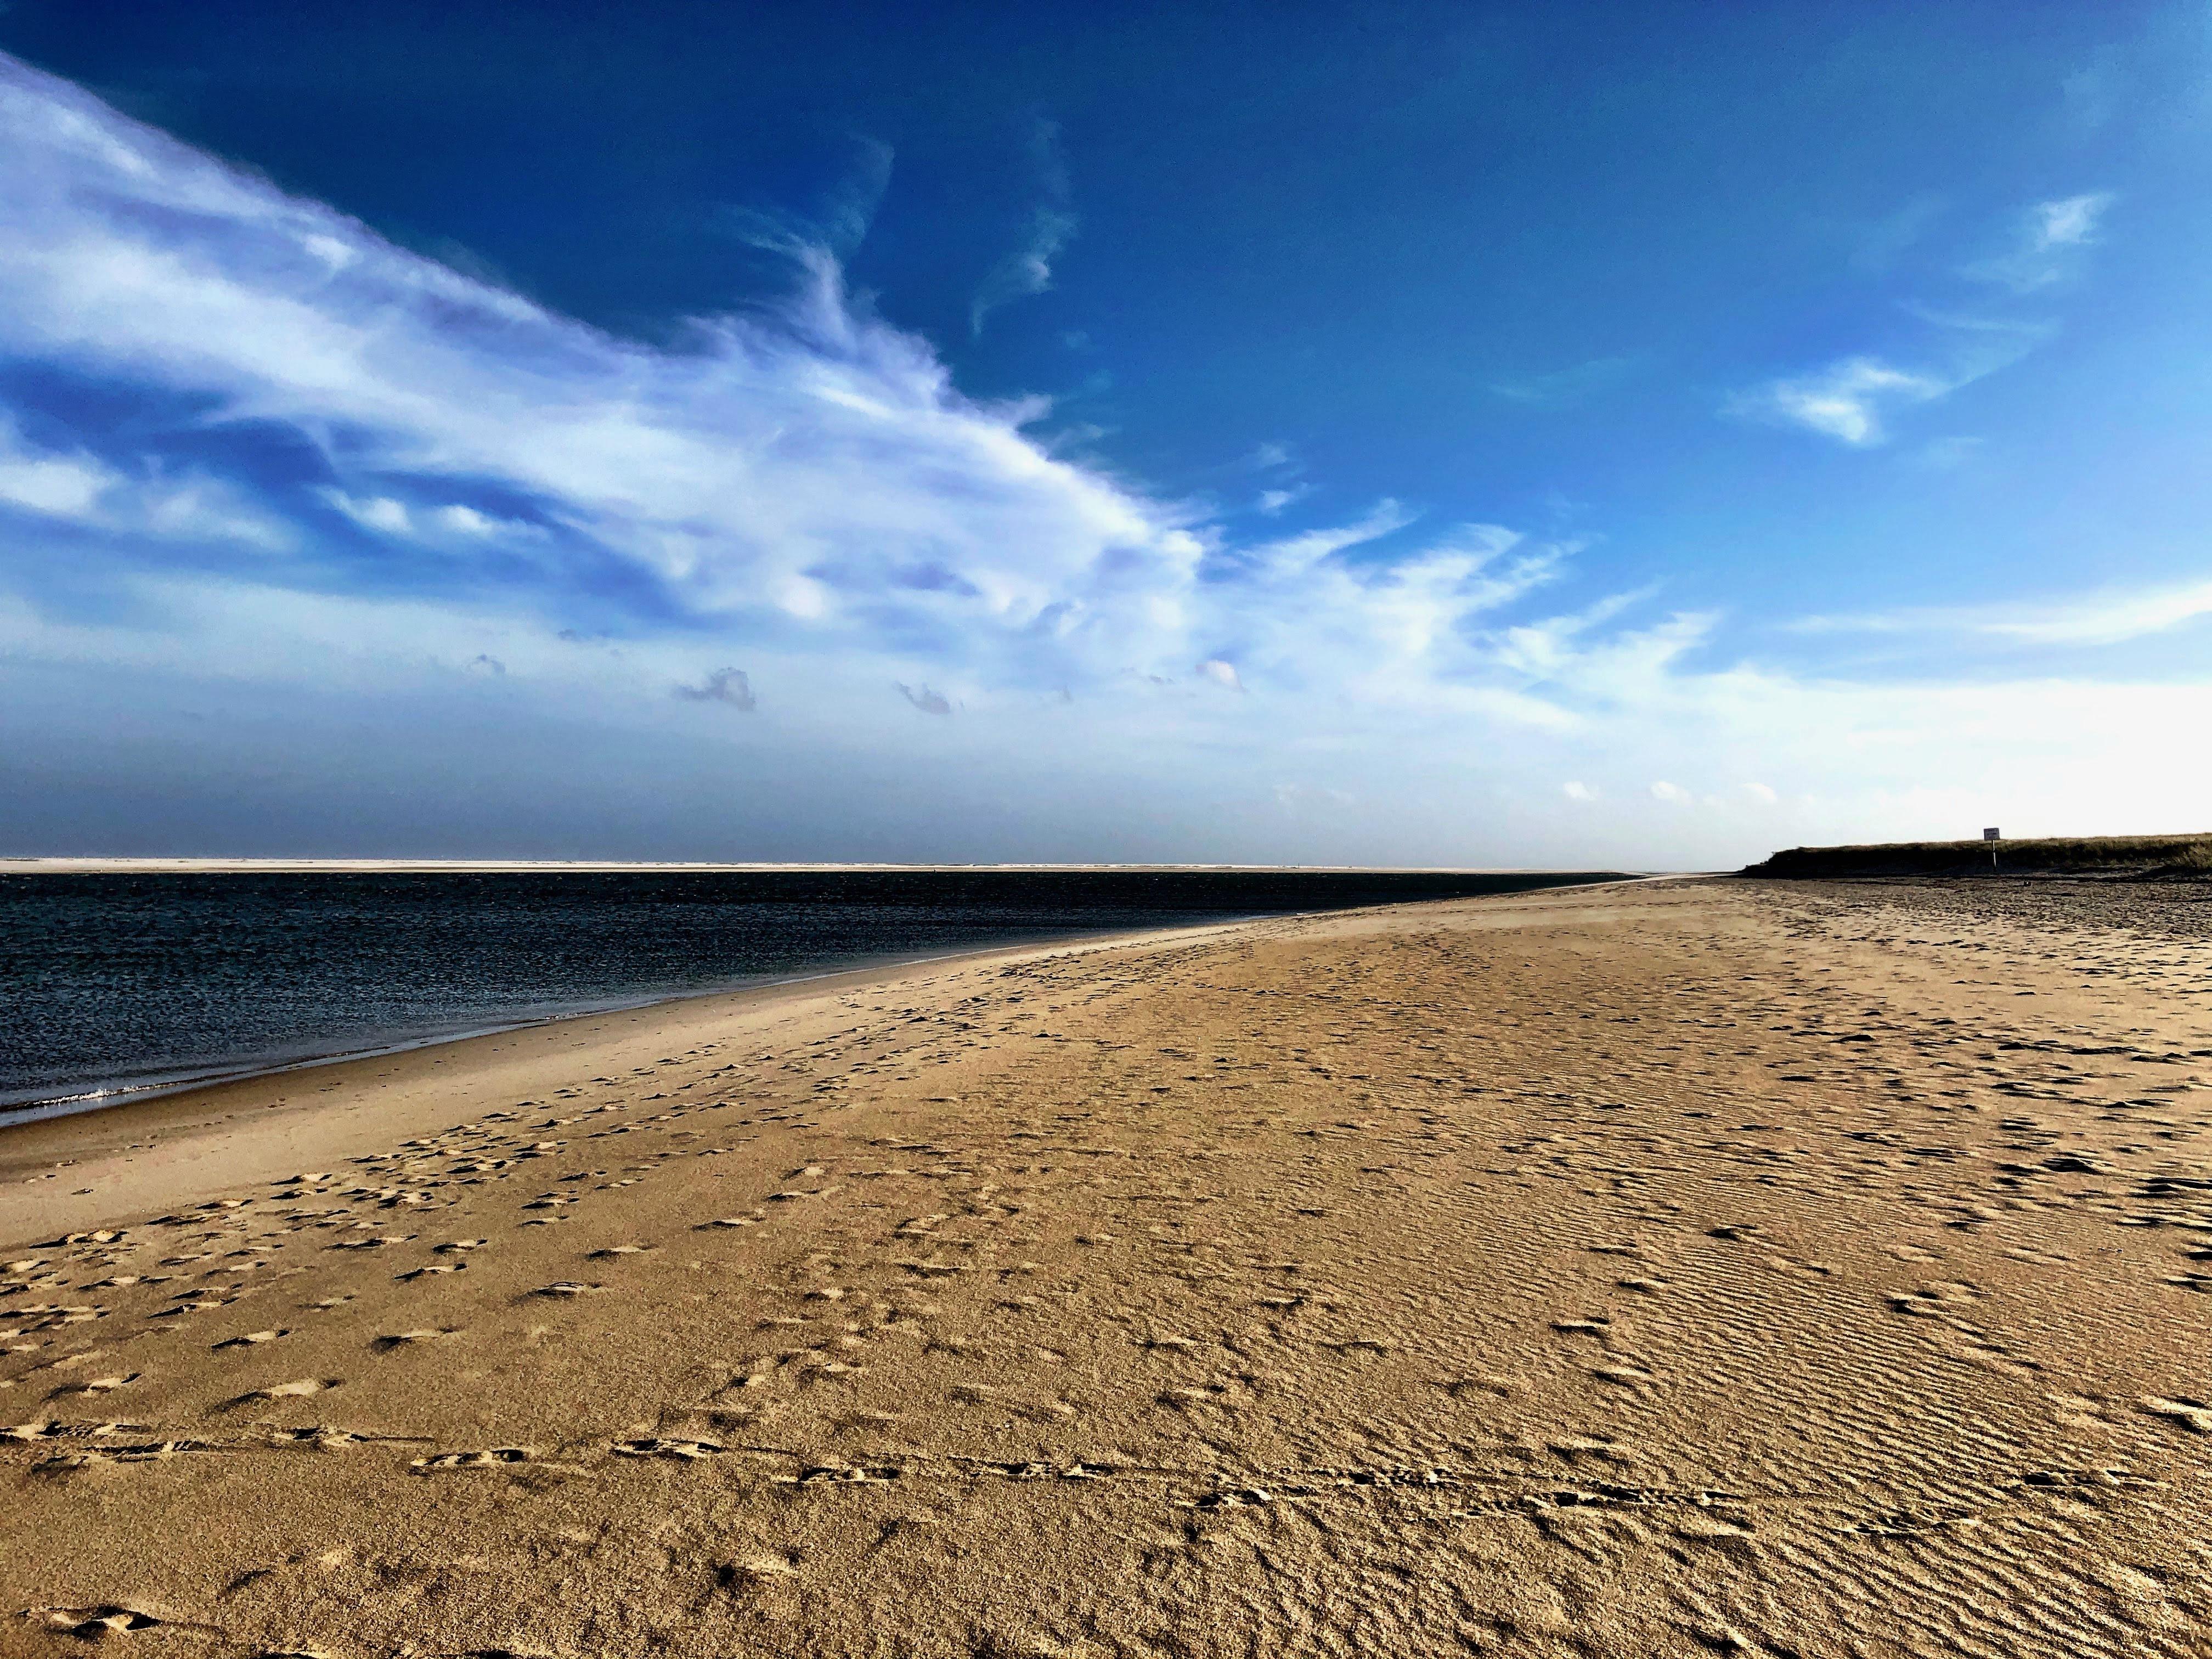 Walking along Cape Cod Beach